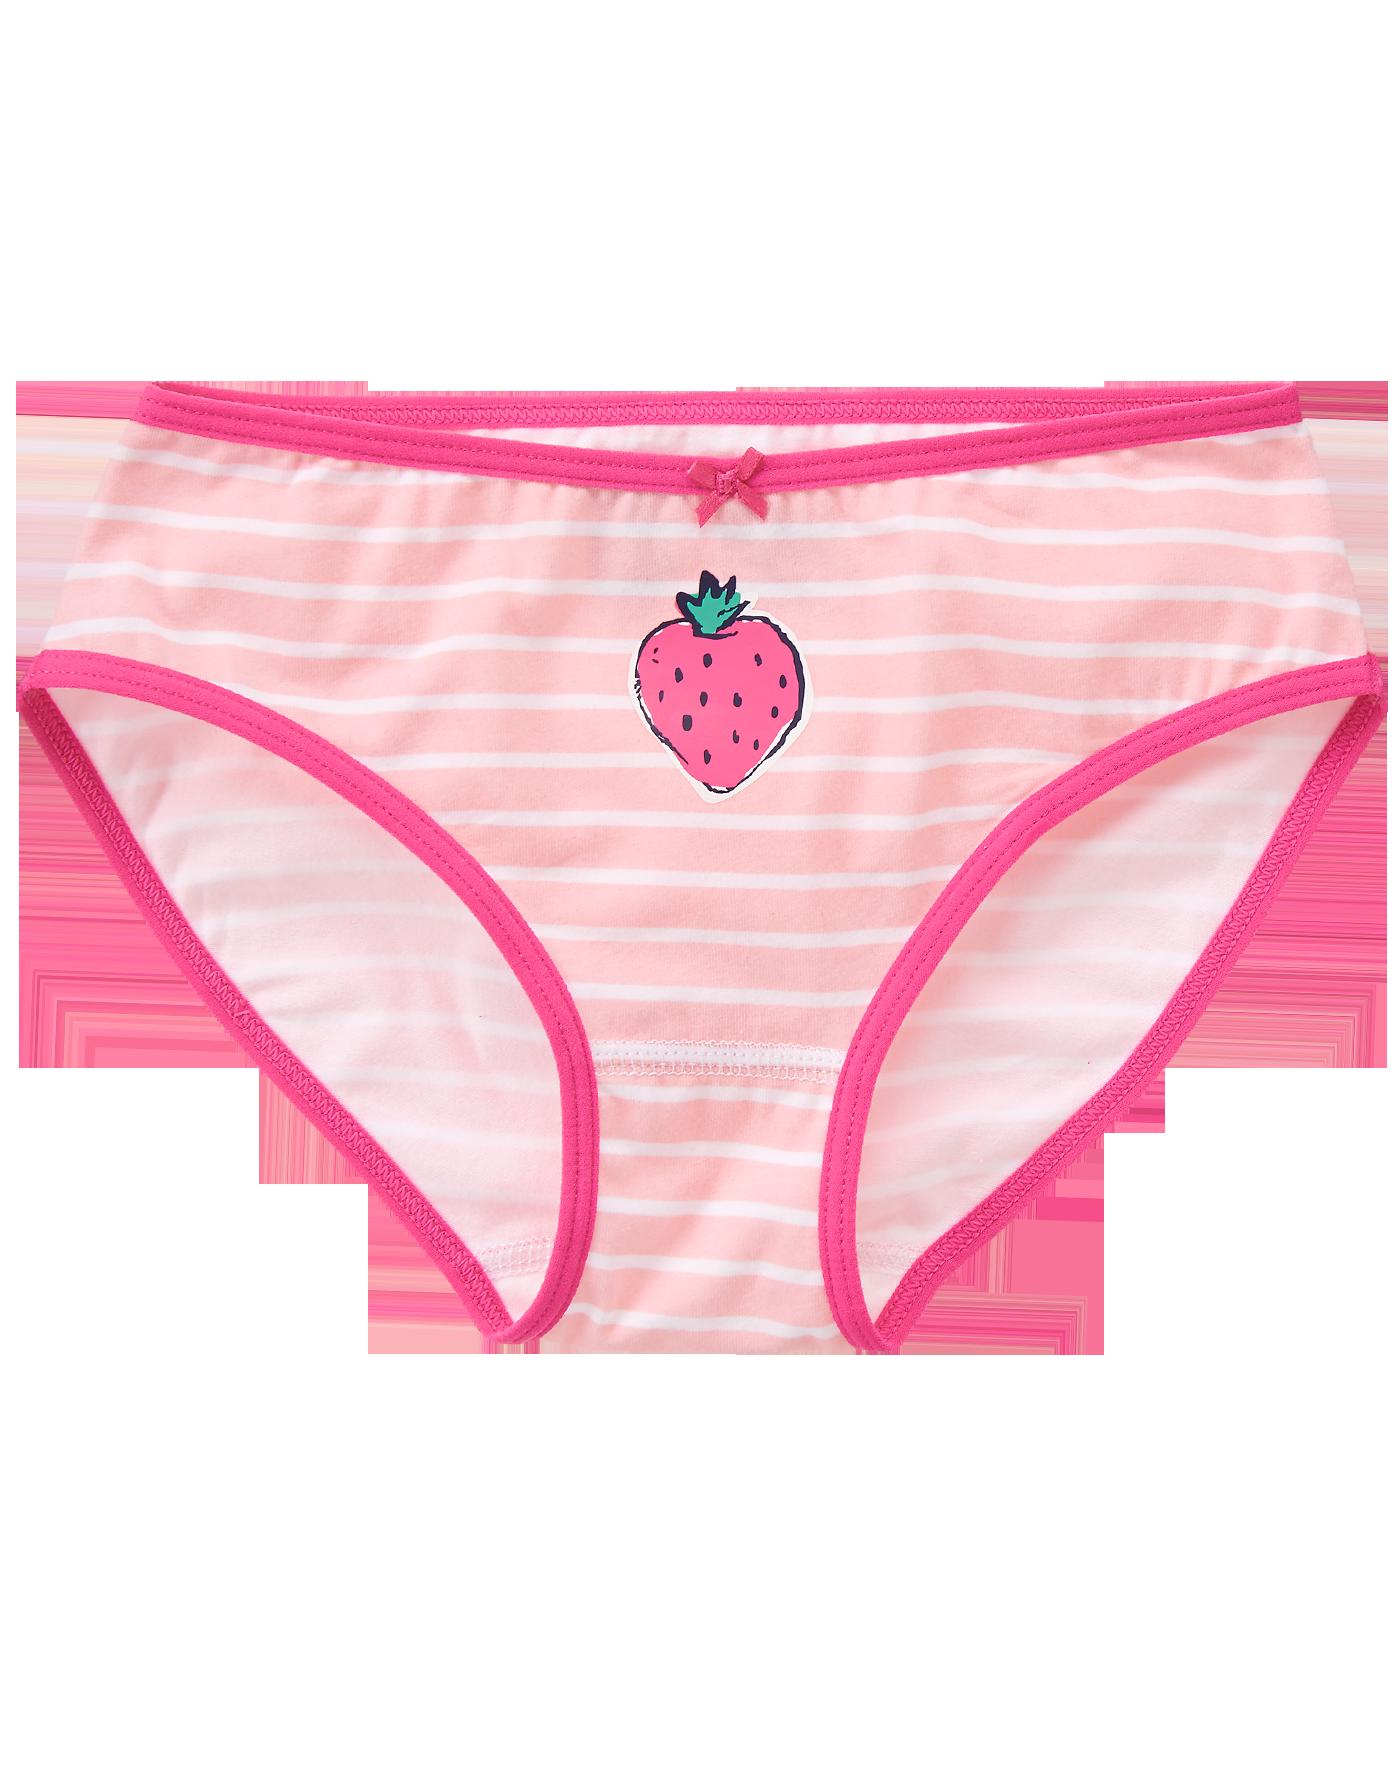 Undies girl from behind clipart vector library download Strawberry Underwear | kids fashion-girls | Toddler ... vector library download